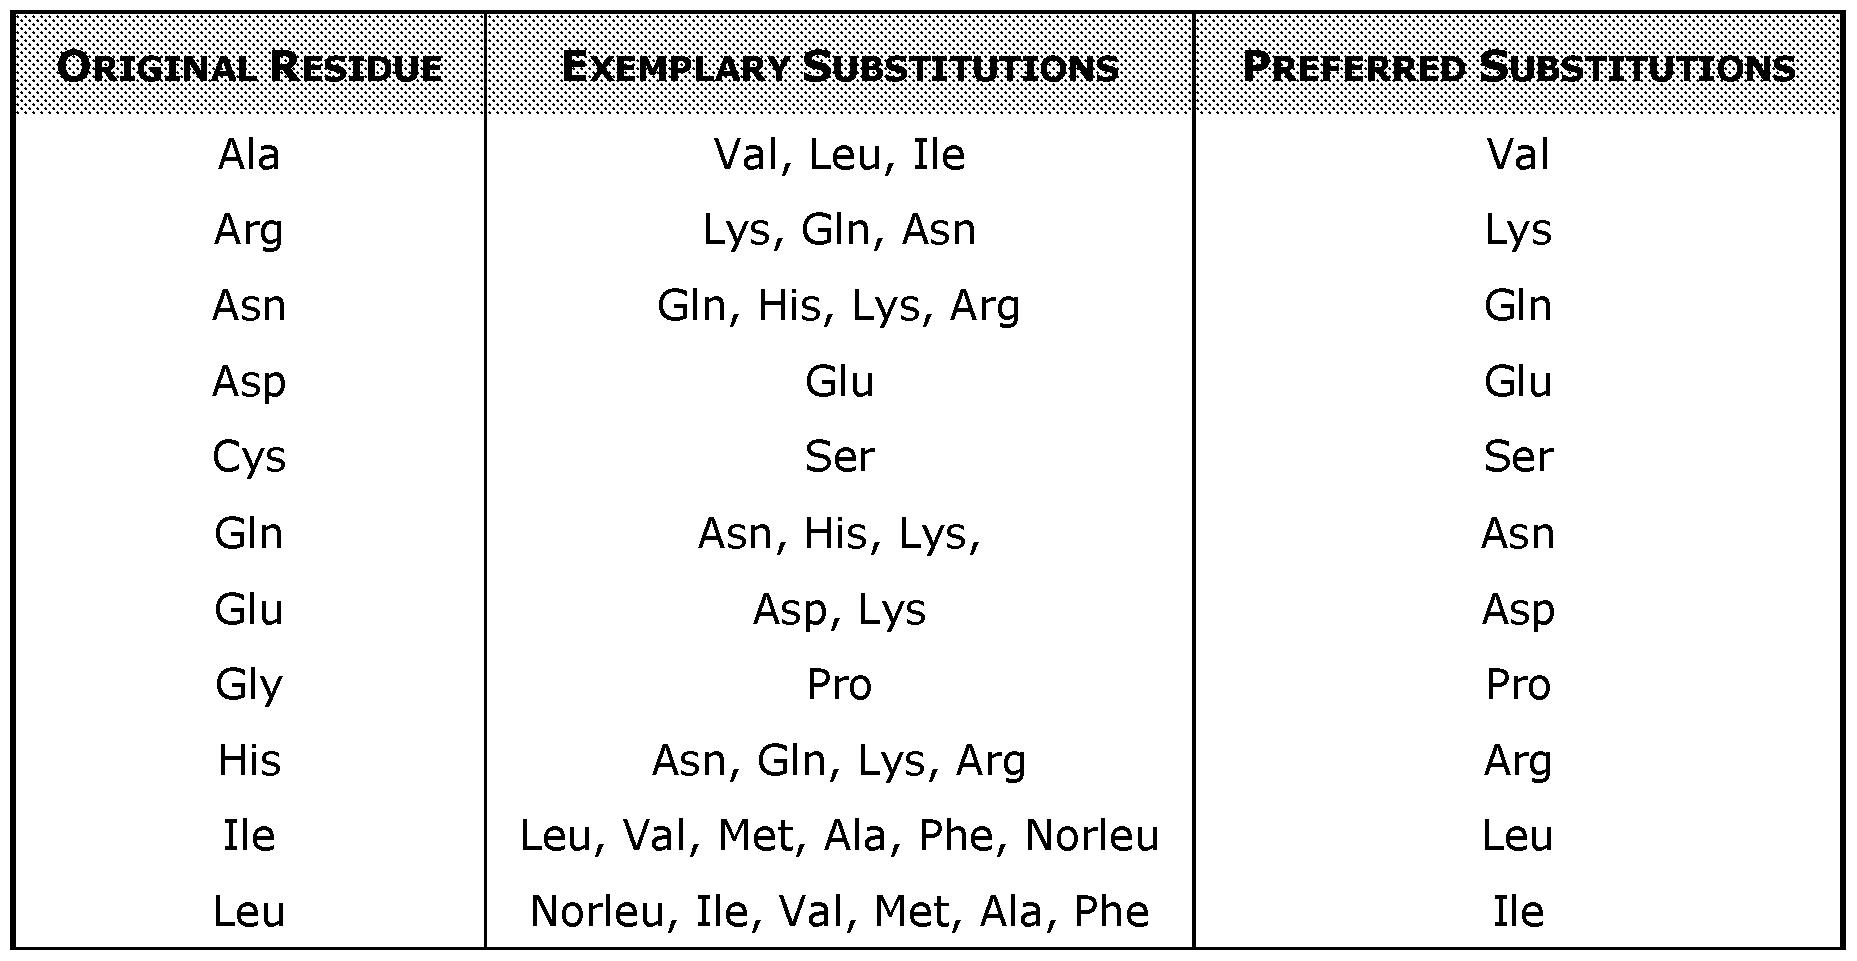 bd526dbe0a1 WO2015179918A1 - Modulation of cellular stress - Google Patents